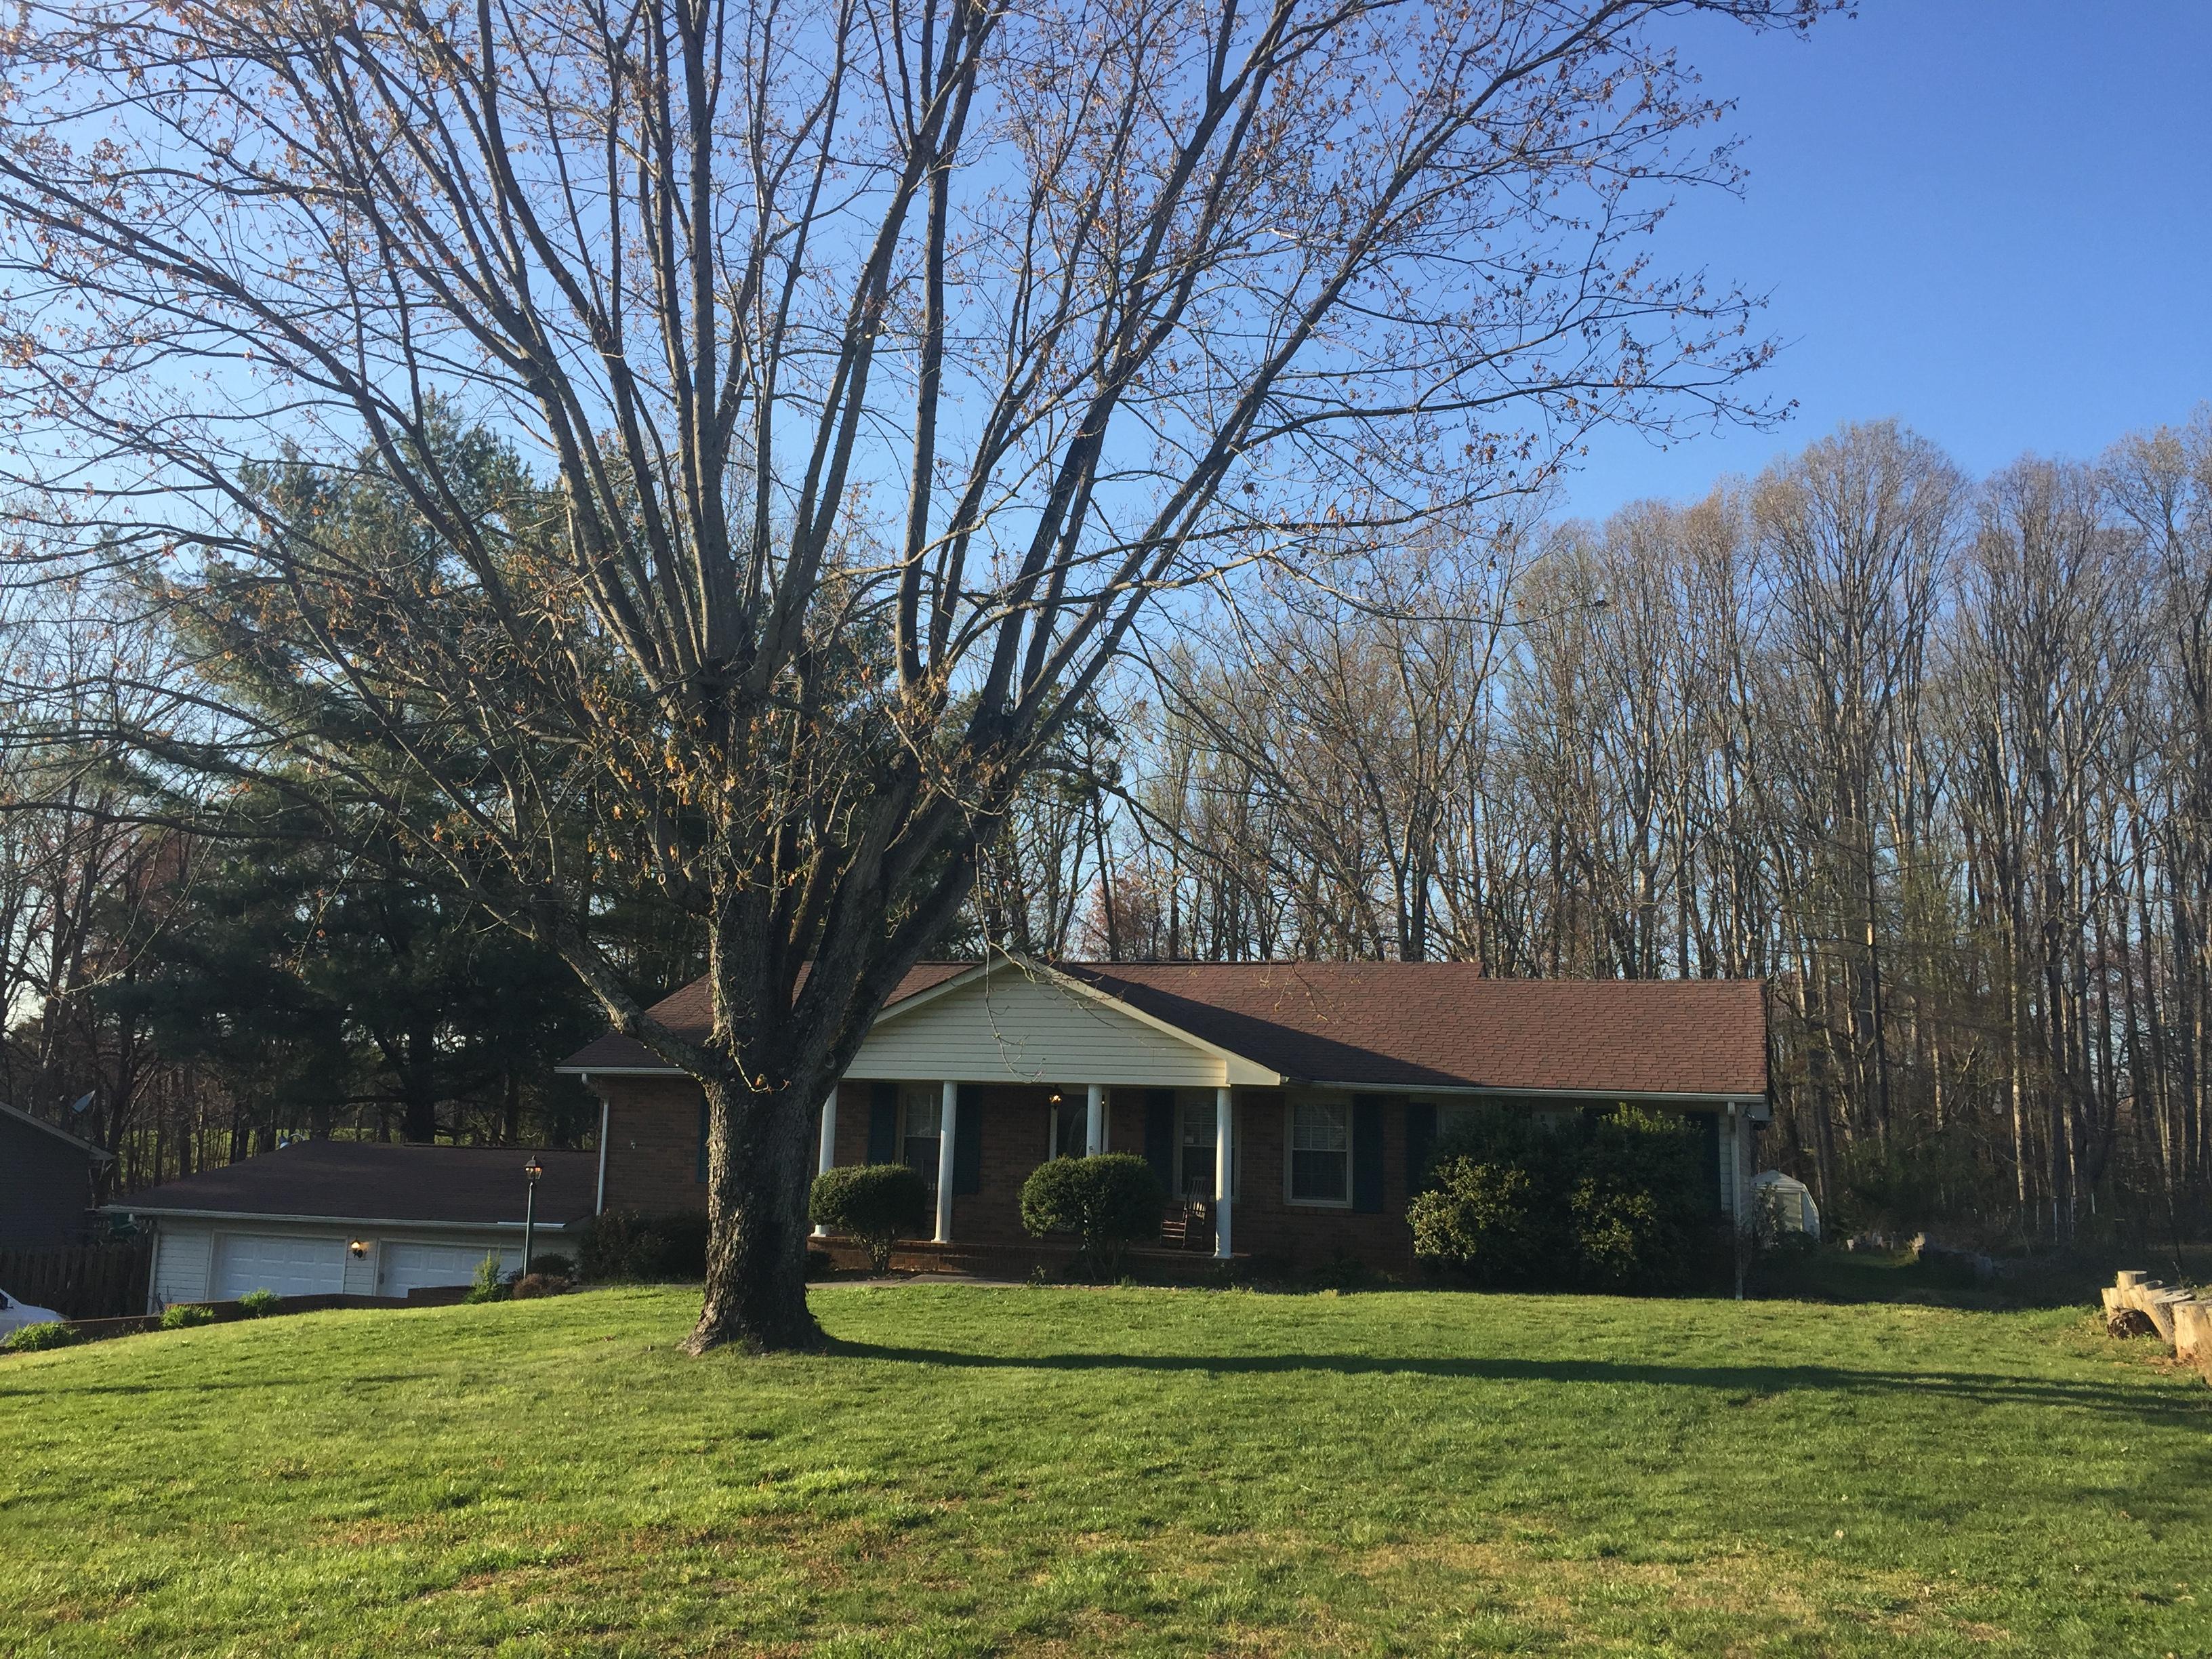 Home for sale: 1036 Dogwood Drive, King, NC